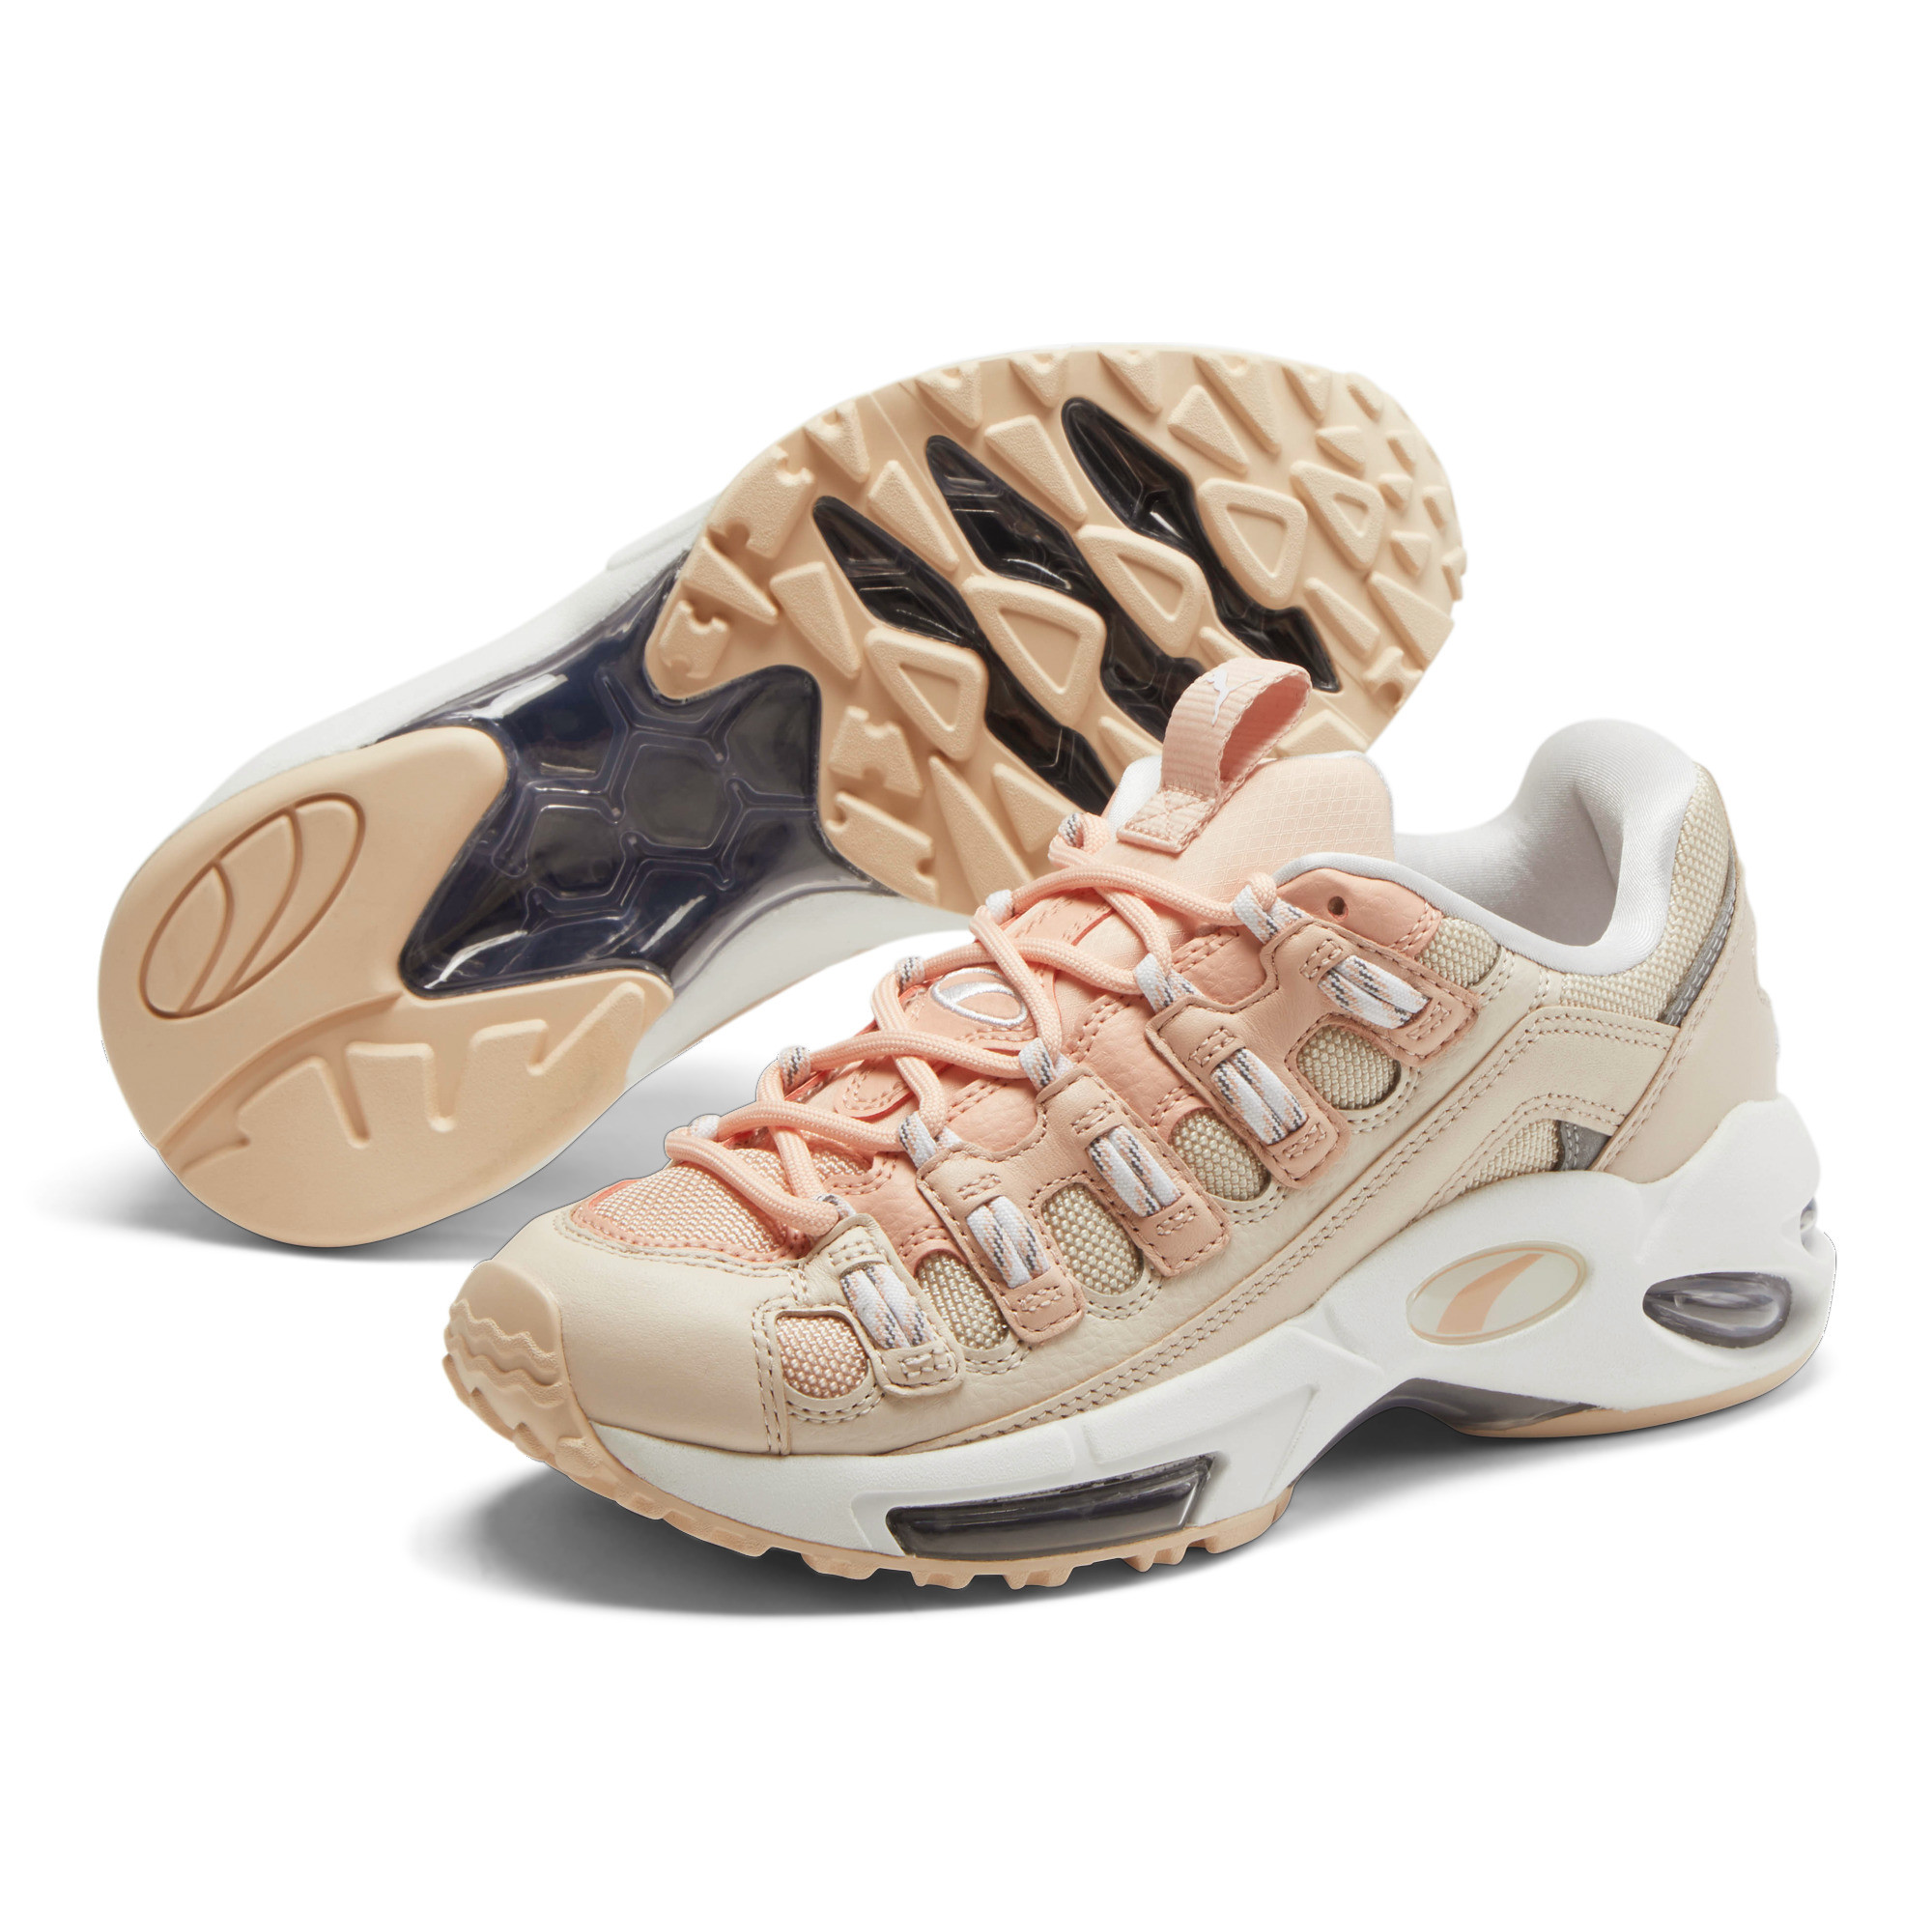 PUMA-CELL-Endura-Rebound-Women-039-s-Sneakers-Women-Shoe-Sport-Classics thumbnail 8